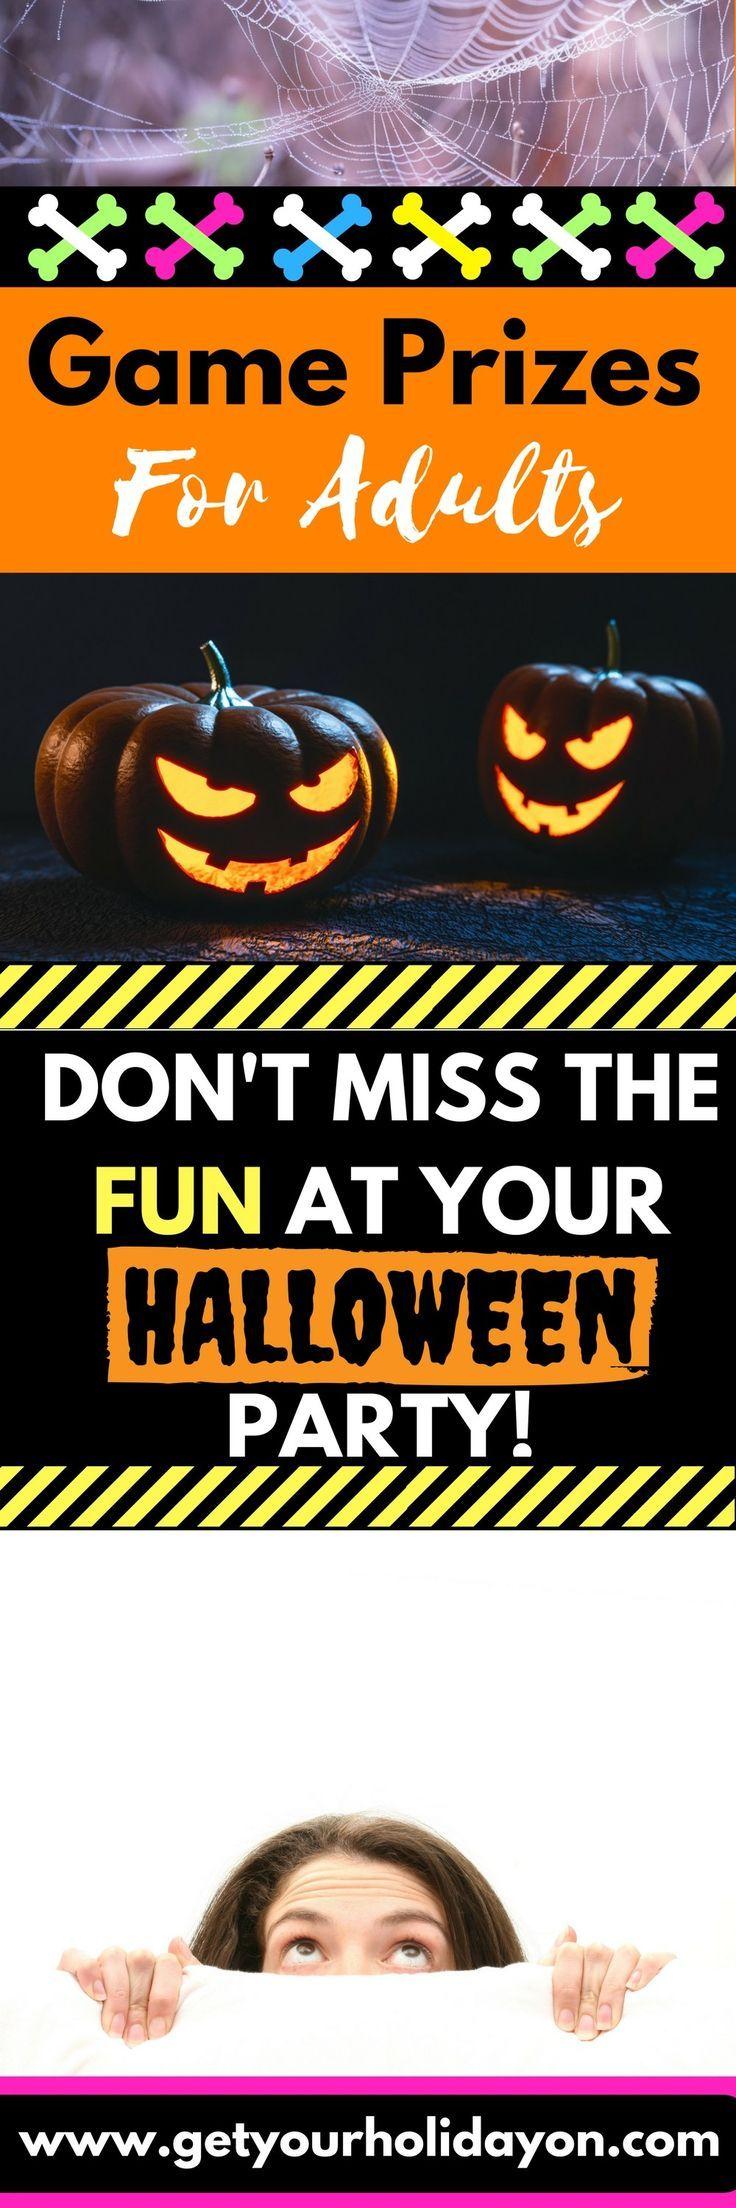 6034 best Halloween images on Pinterest